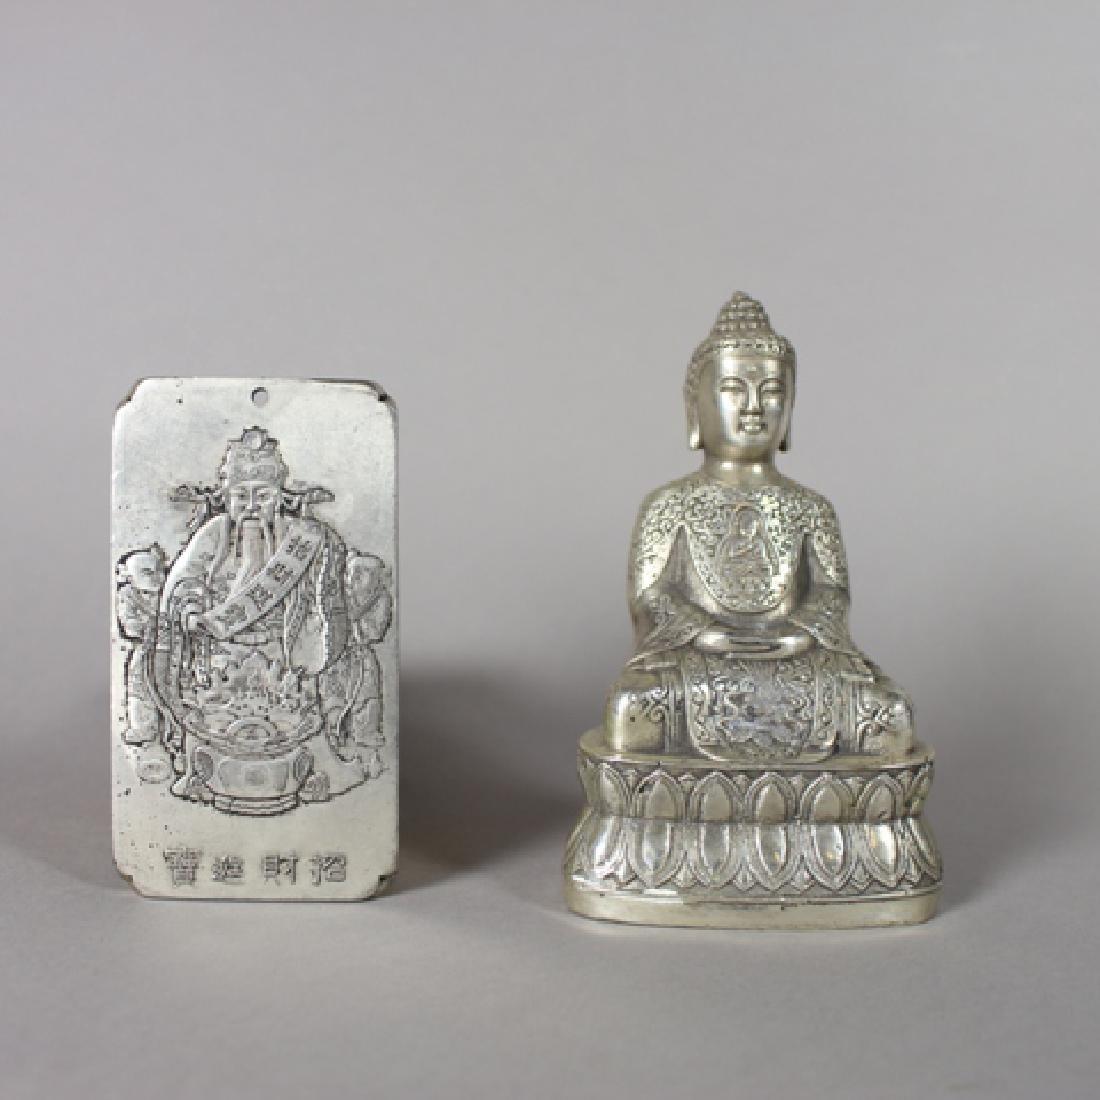 Chinese Silver Pendant and Tibetan Silver Buddha